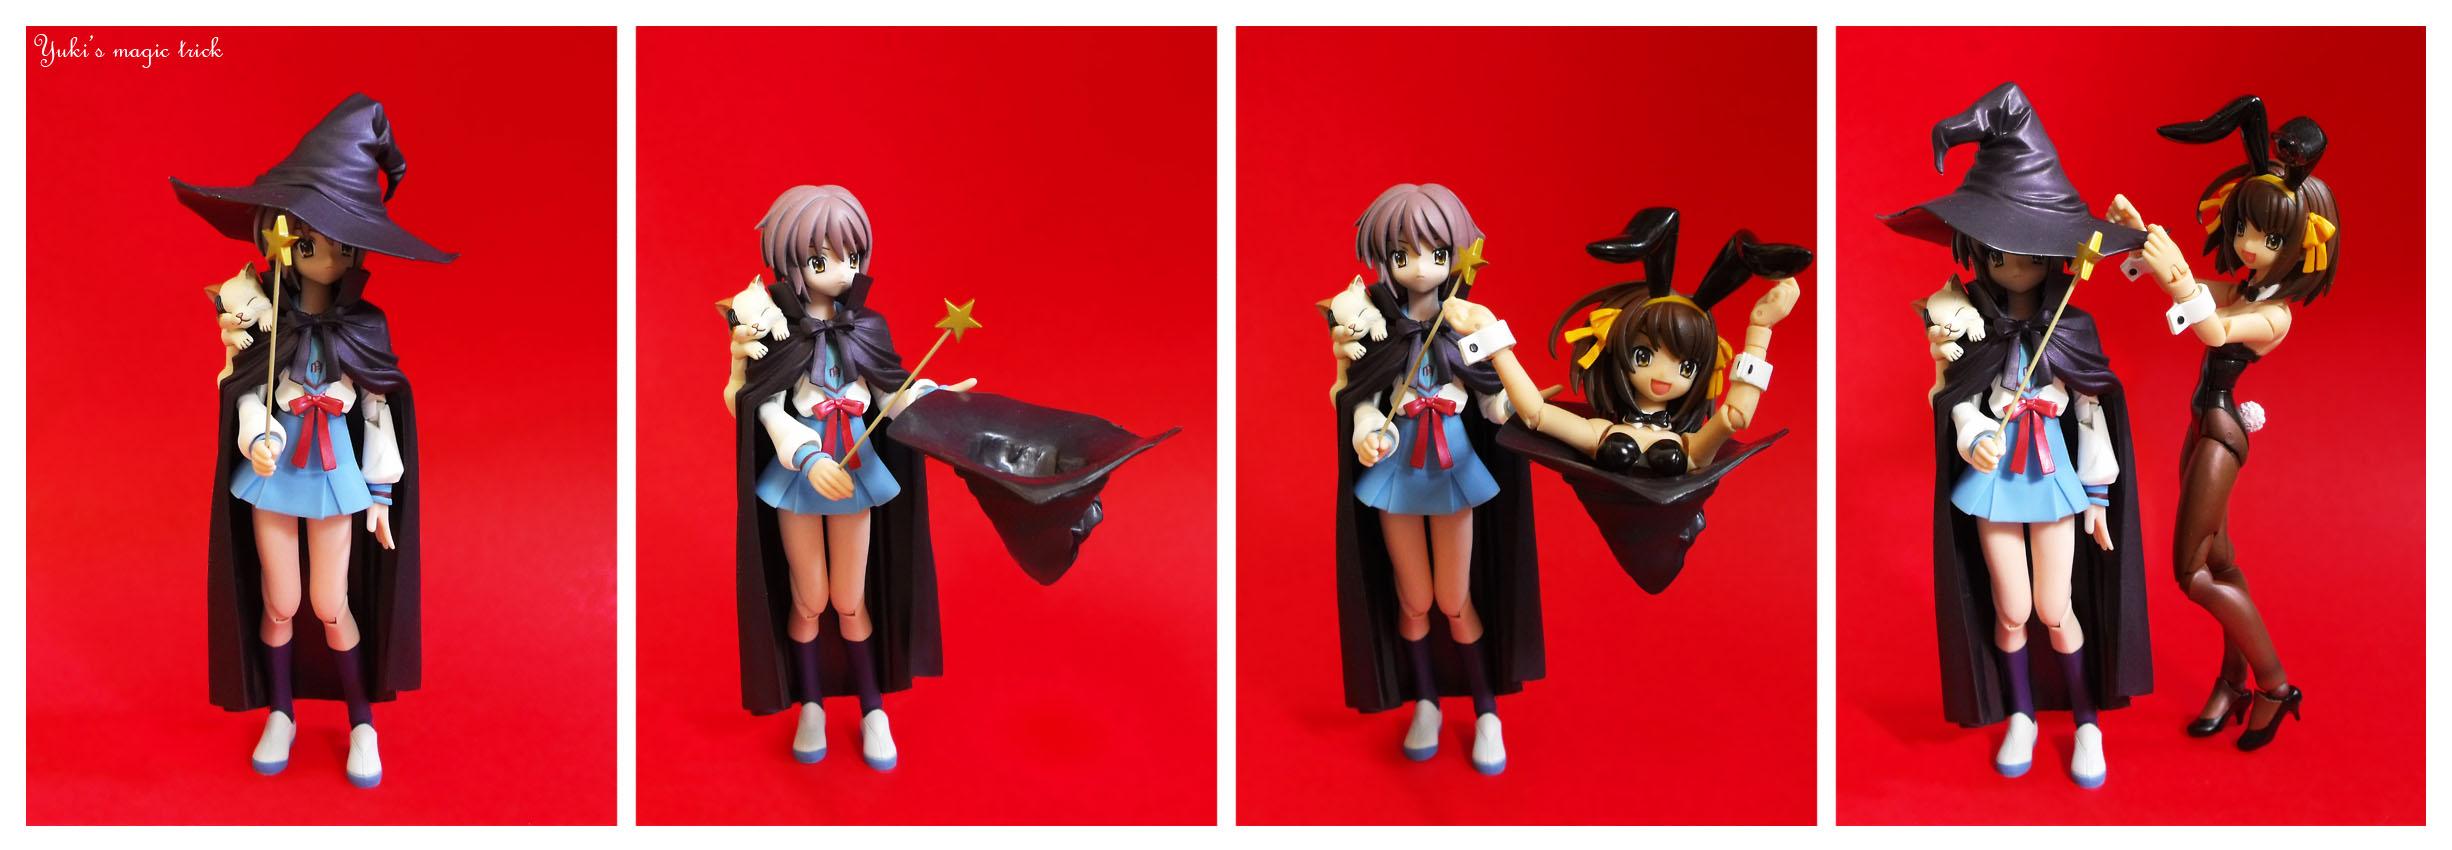 cat cape witch_hat bunnysuit comics suzumiya_haruhi nagato_yuki magic_wand red_background magic_trick